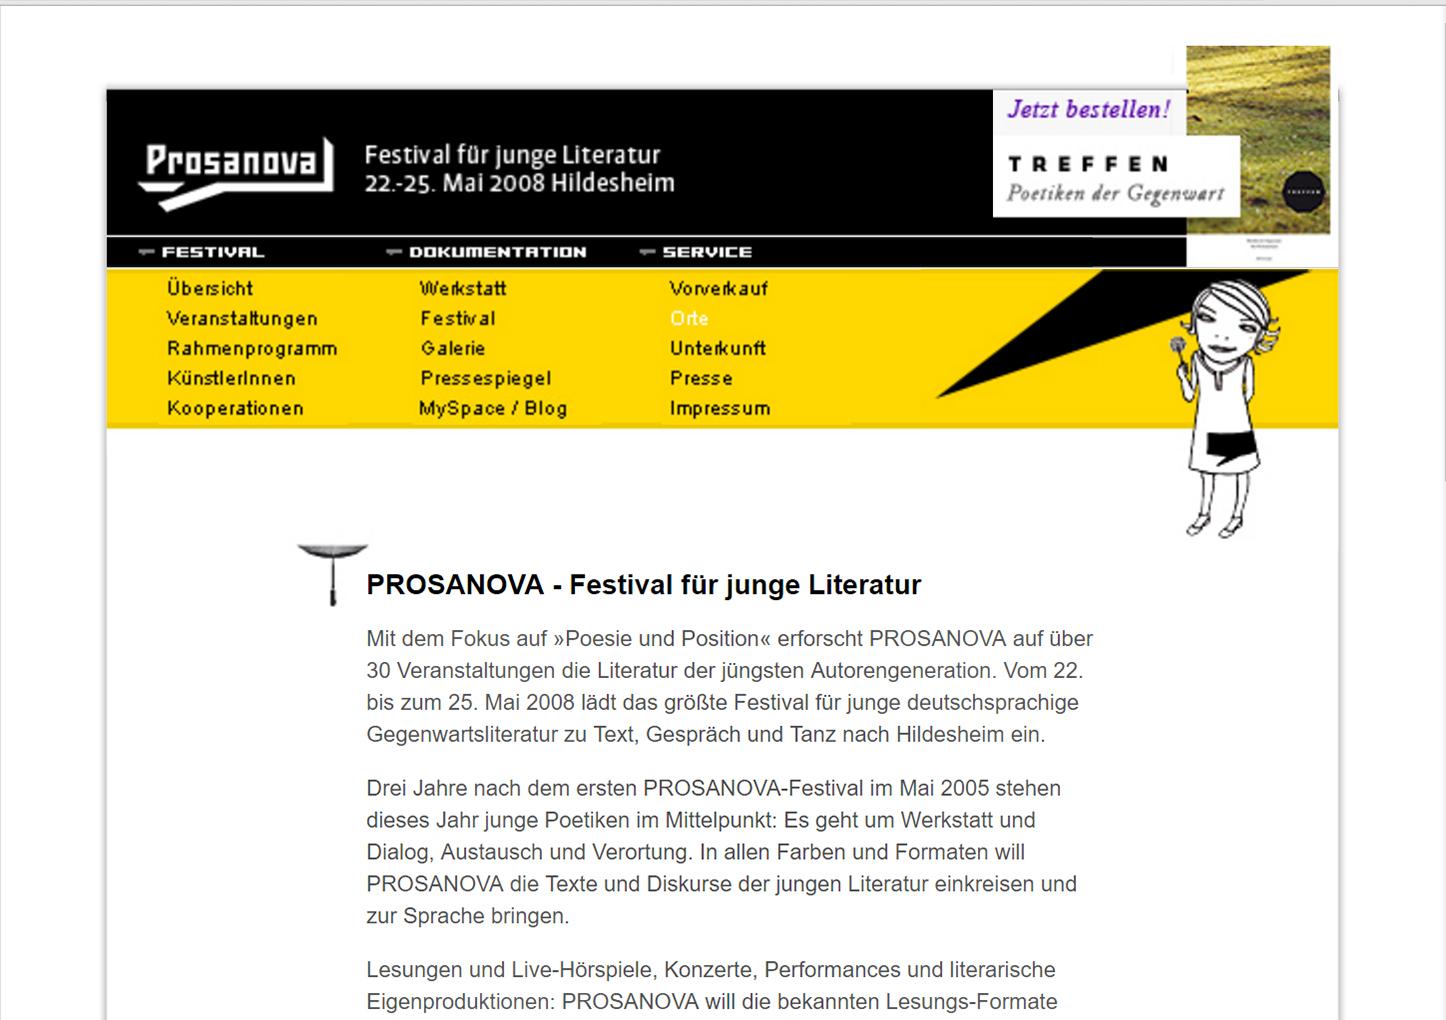 Prosanova 2008